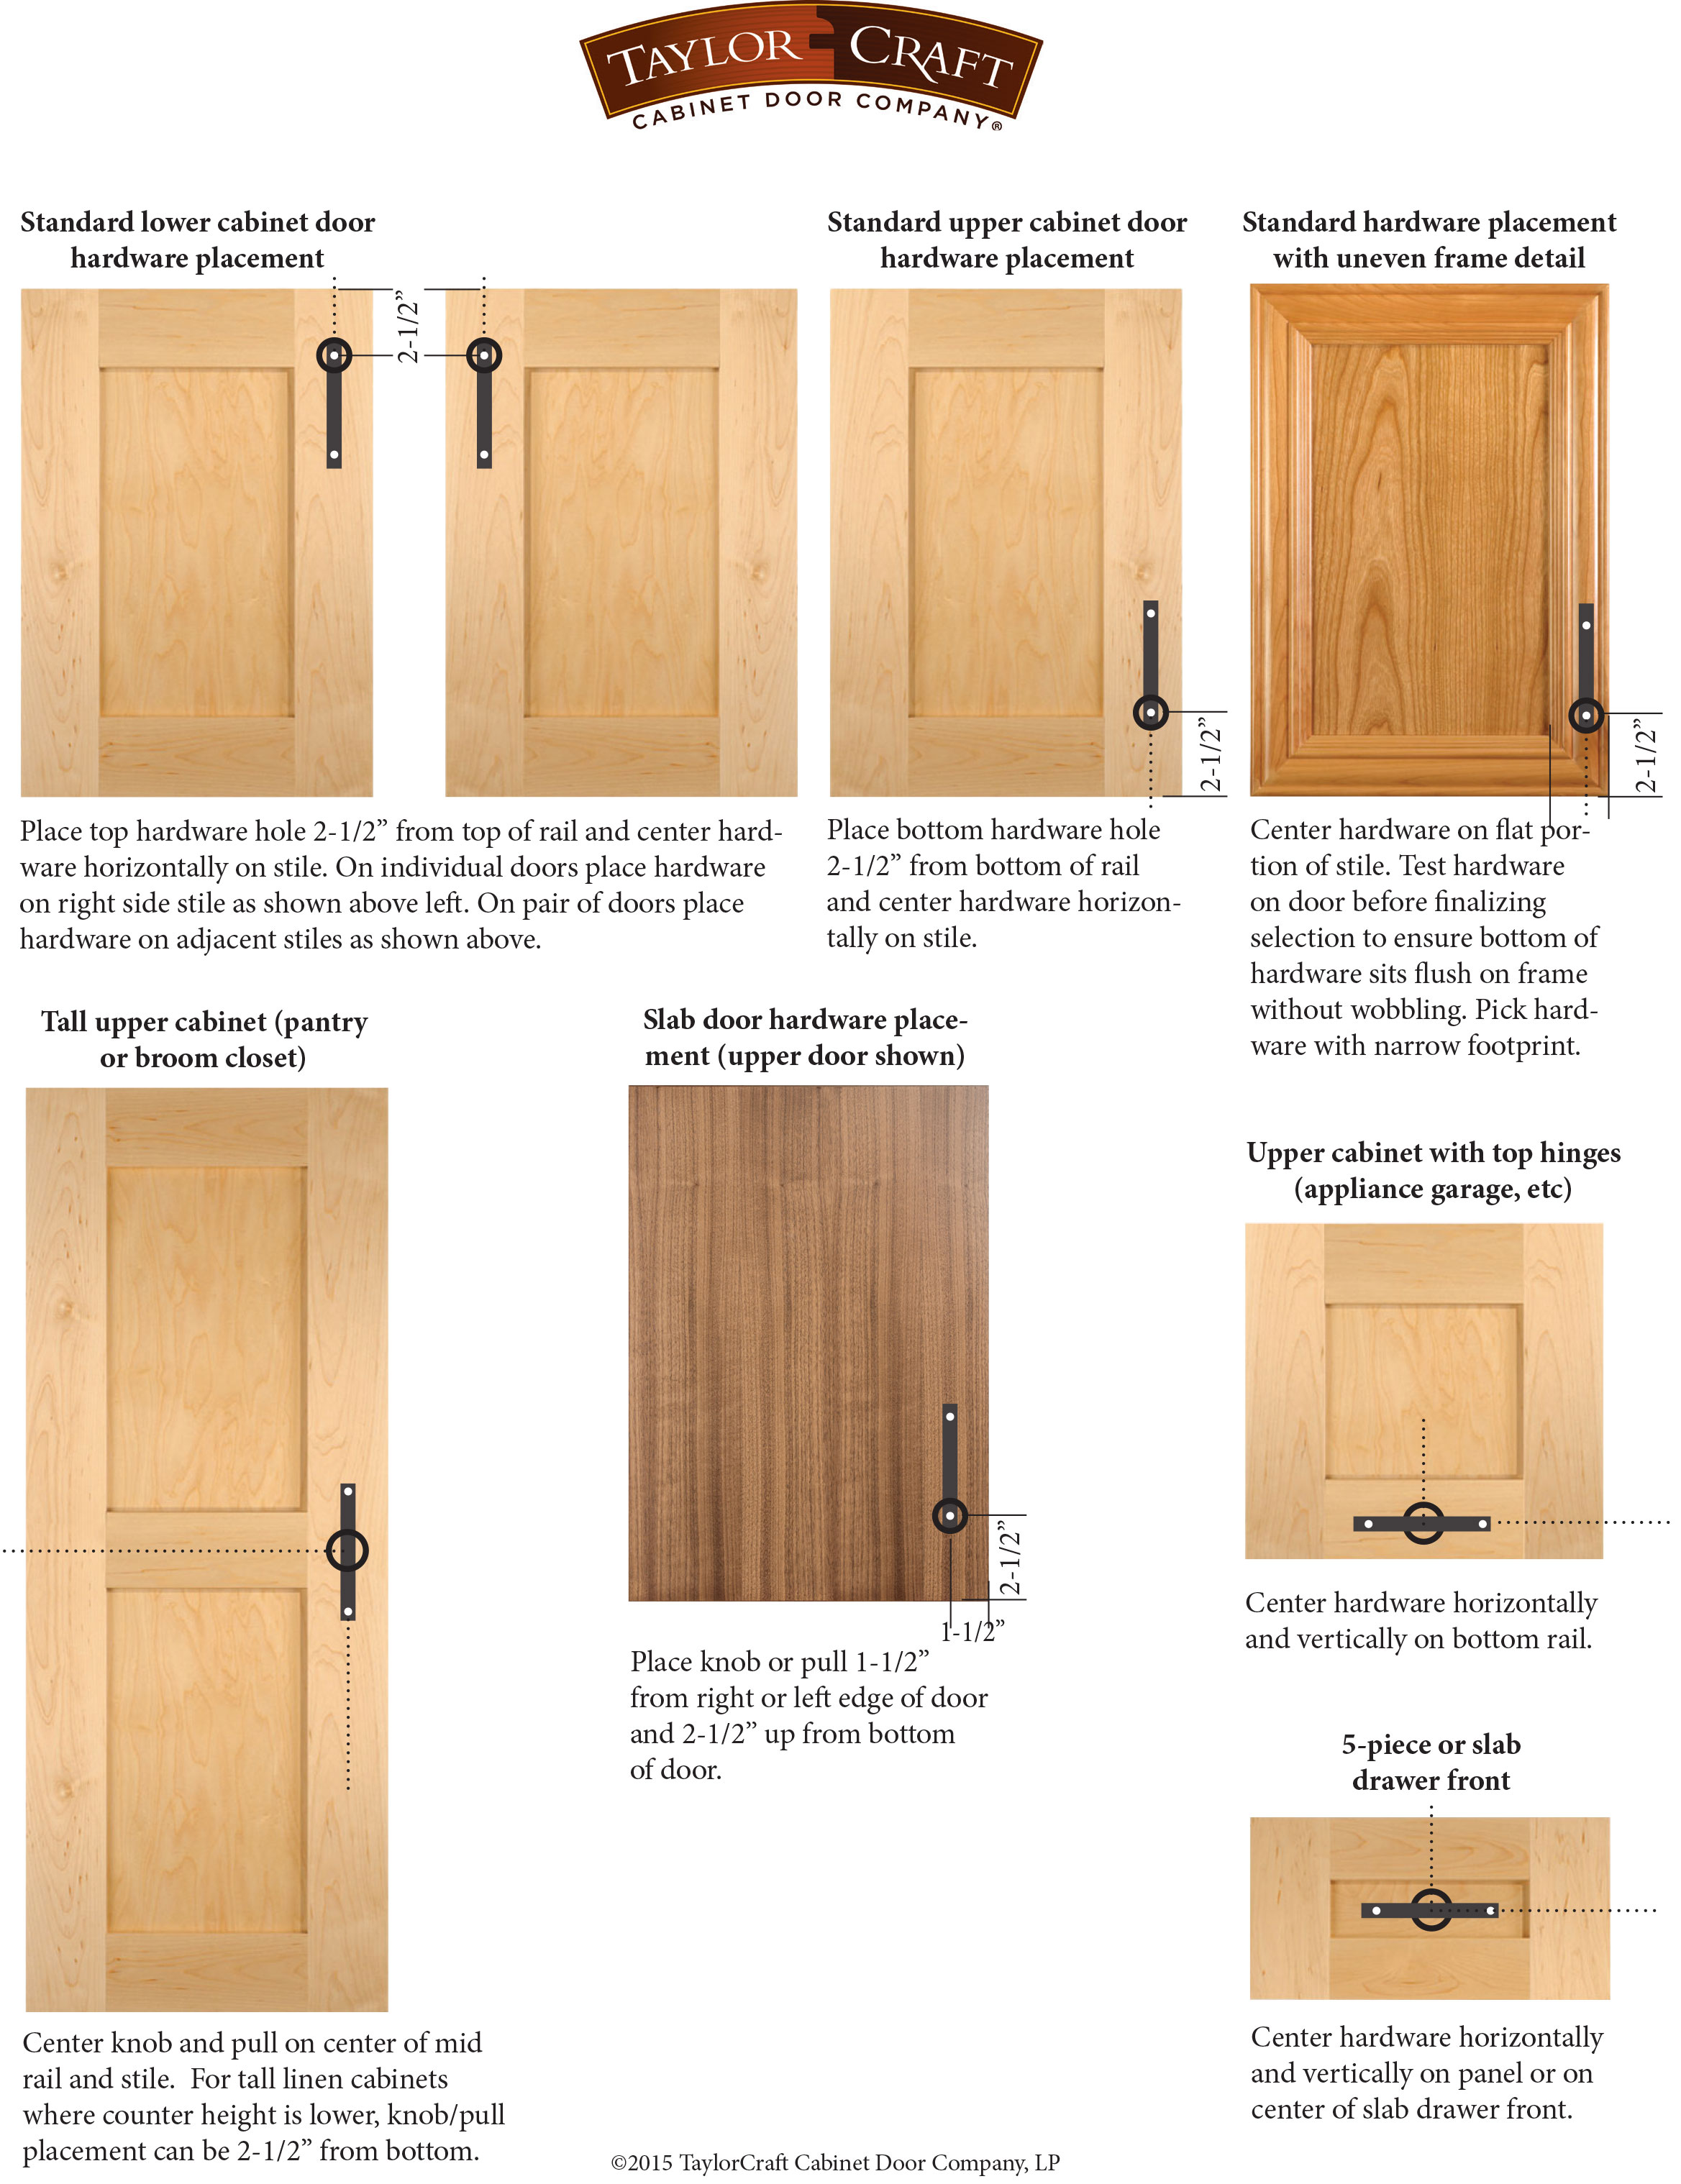 cabinet door hardware placement recommendations